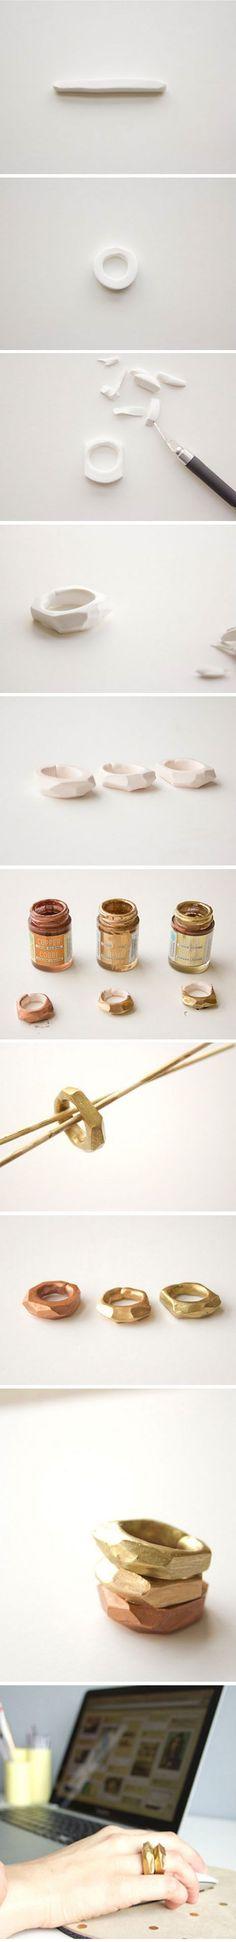 TUTORIAL handmade geometric rings made of polymer clay, faux metal http://media-cache-ec0.pinimg.com/originals/68/db/e9/68dbe915e960b80c24becfb9e6aae6b1.jpg: